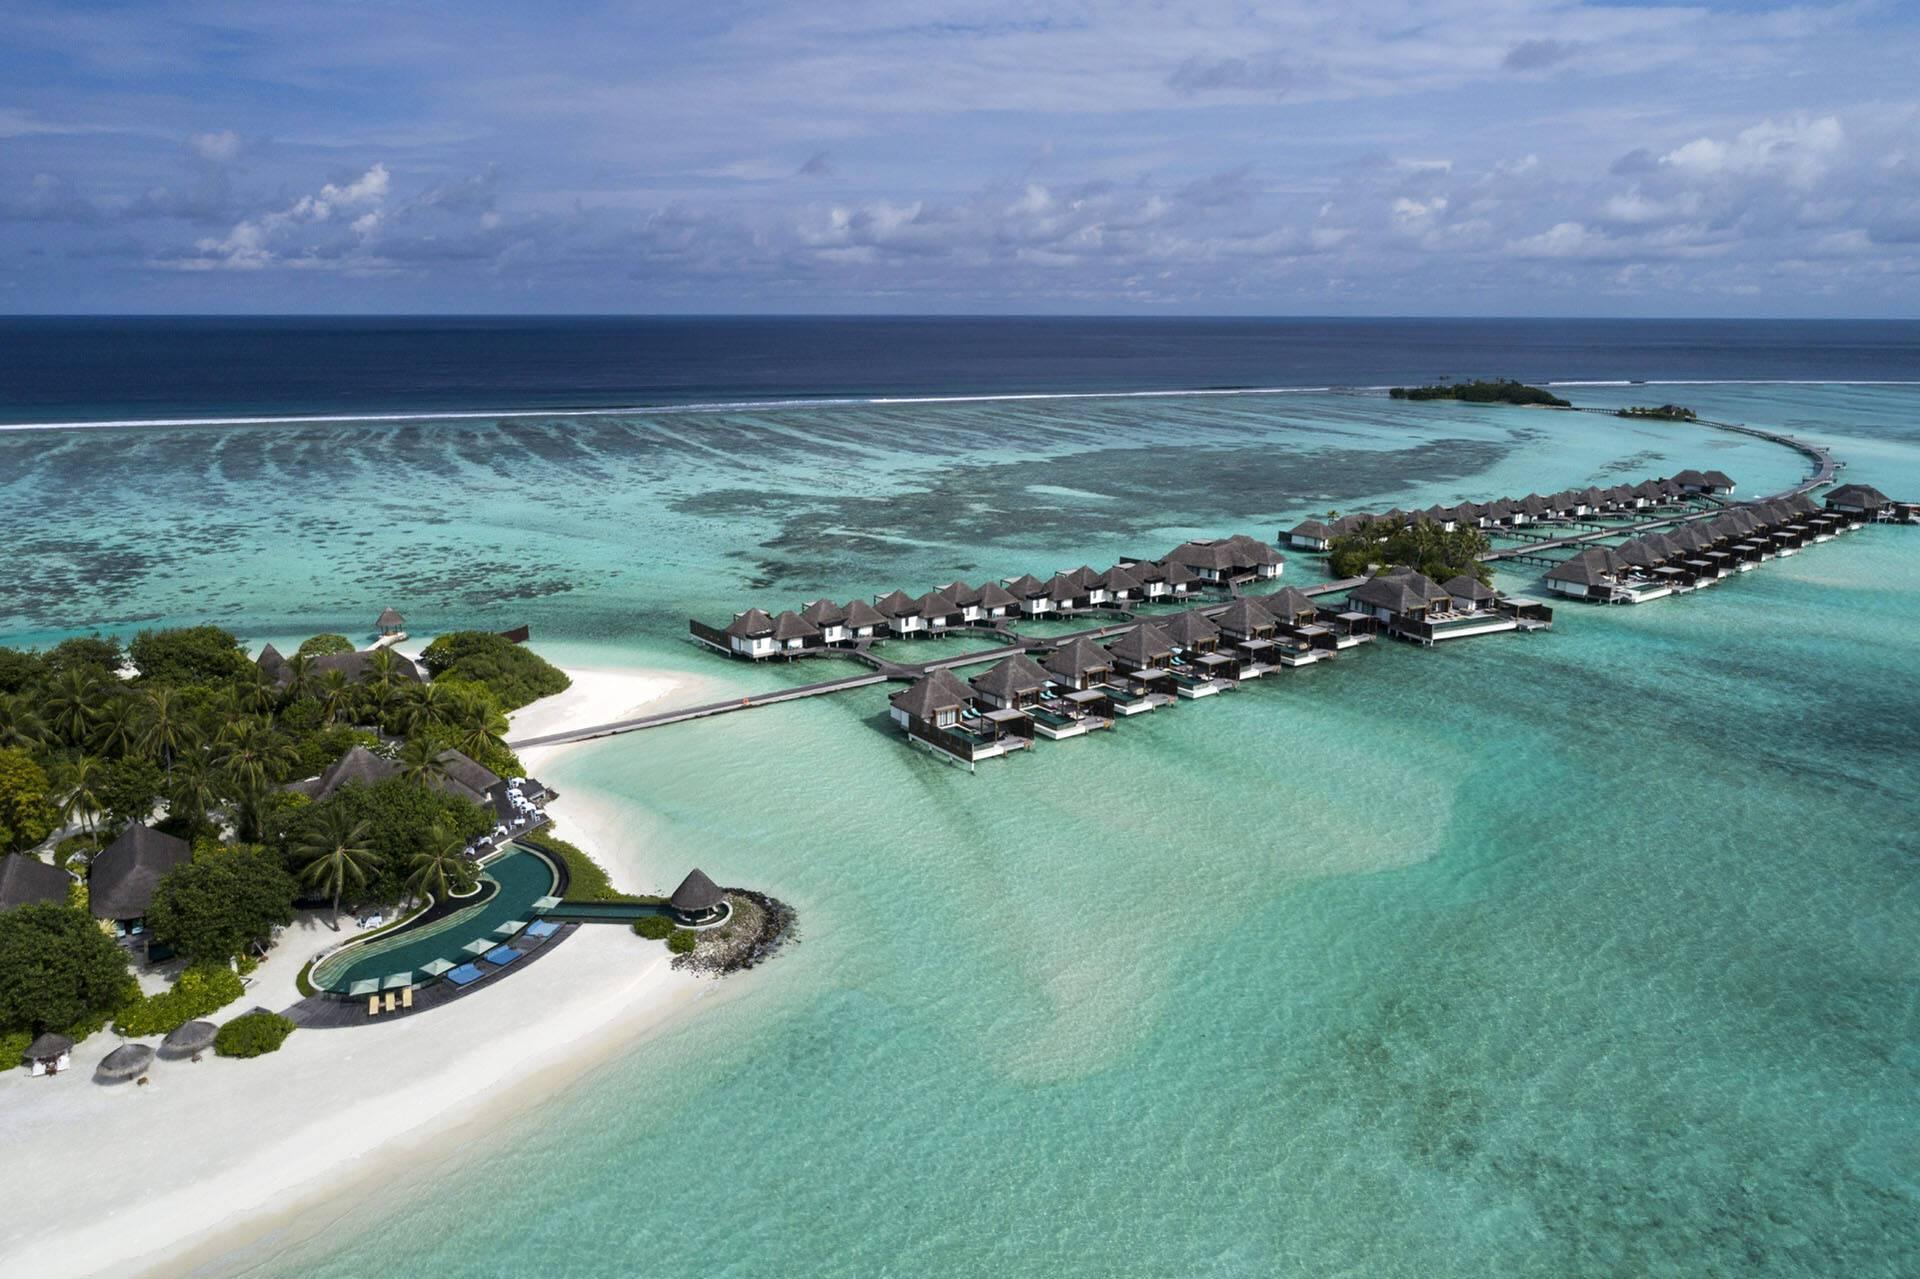 Four Seasons Kuda Huraa Maldives ile